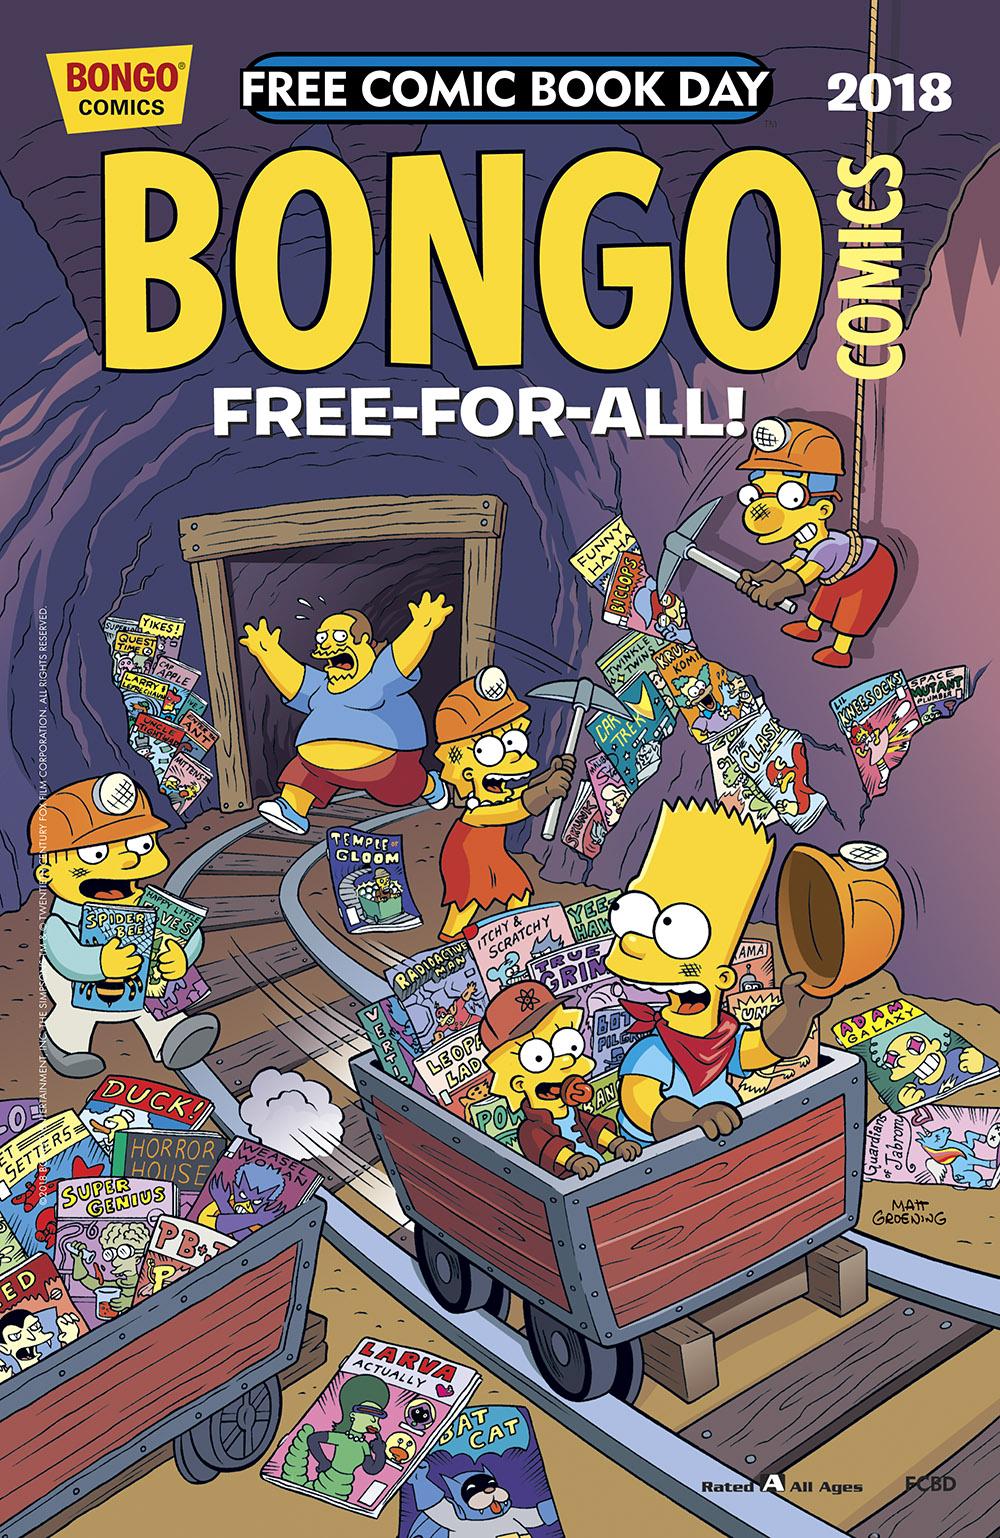 FCBD18_S_Bongo_The Simpsons.jpg